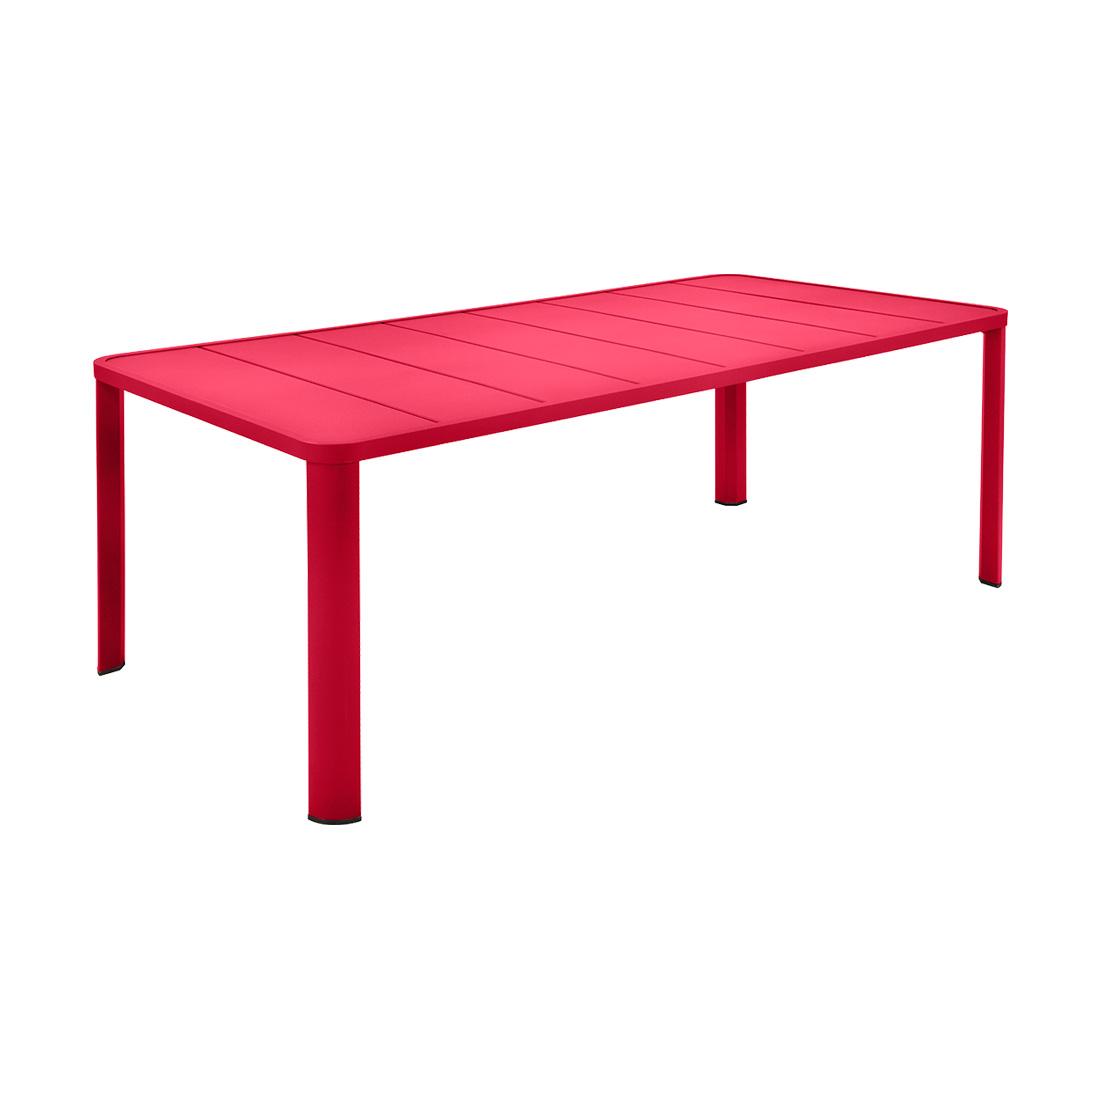 outdoor metal table. Nextprev Outdoor Metal Table N